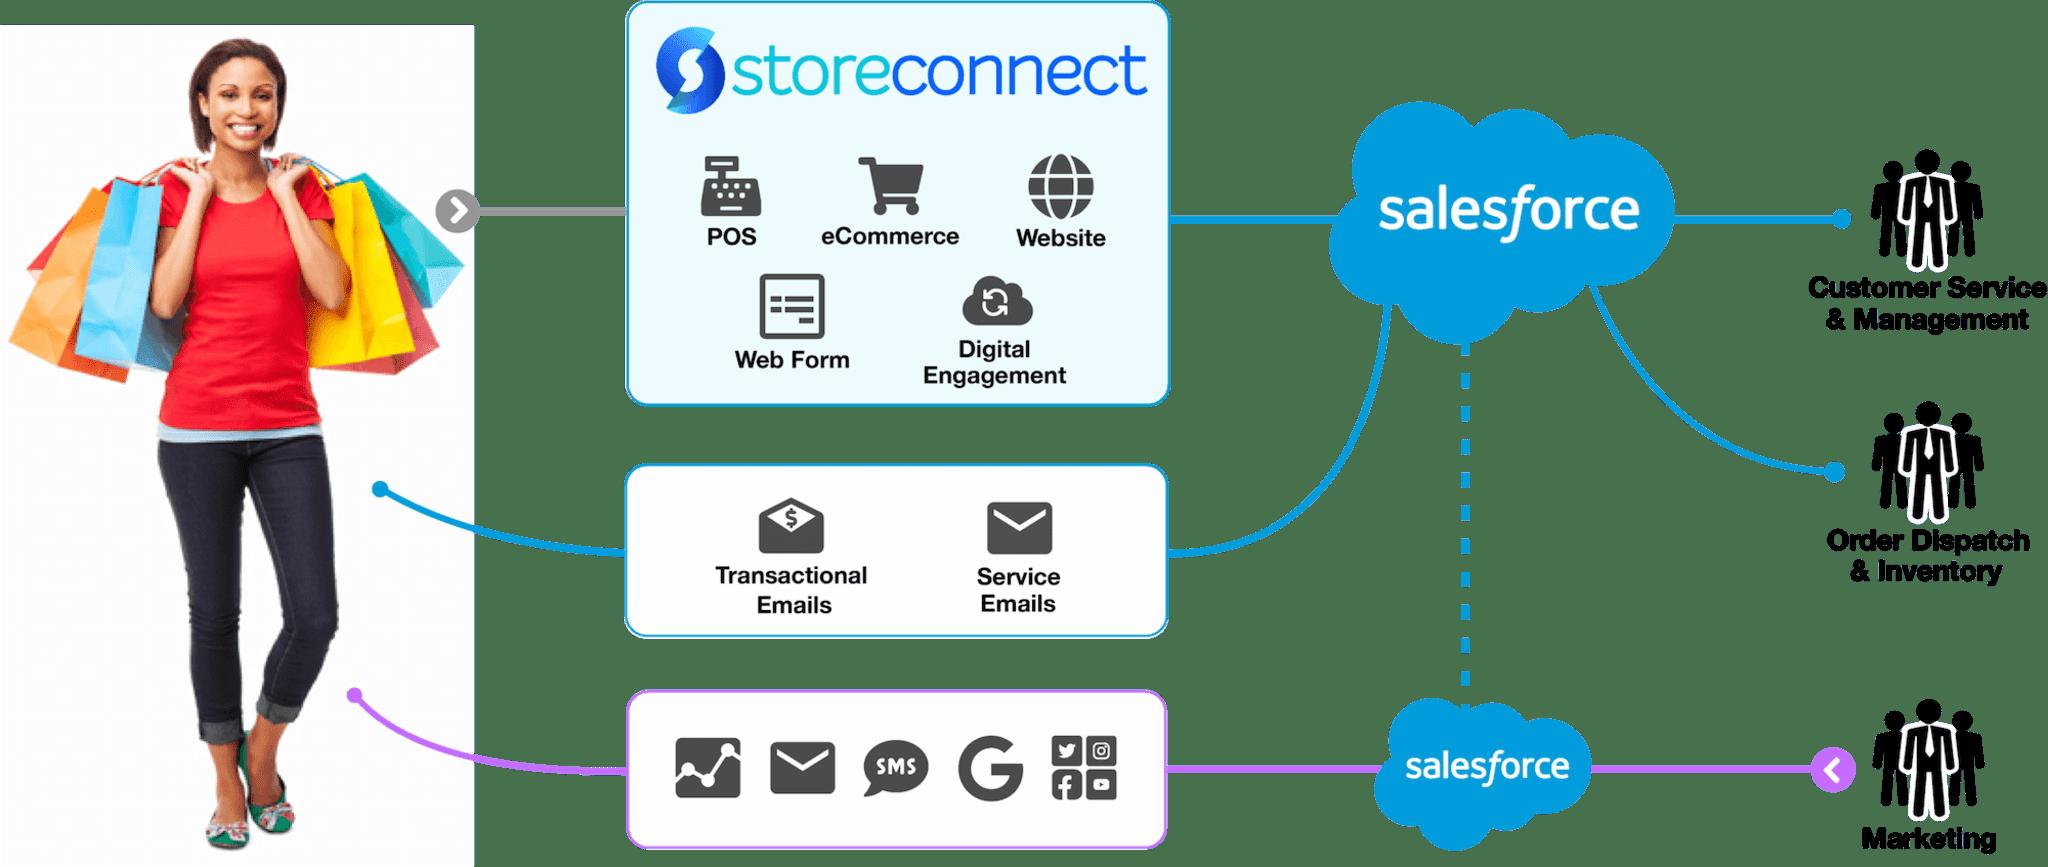 Customer Flow Image